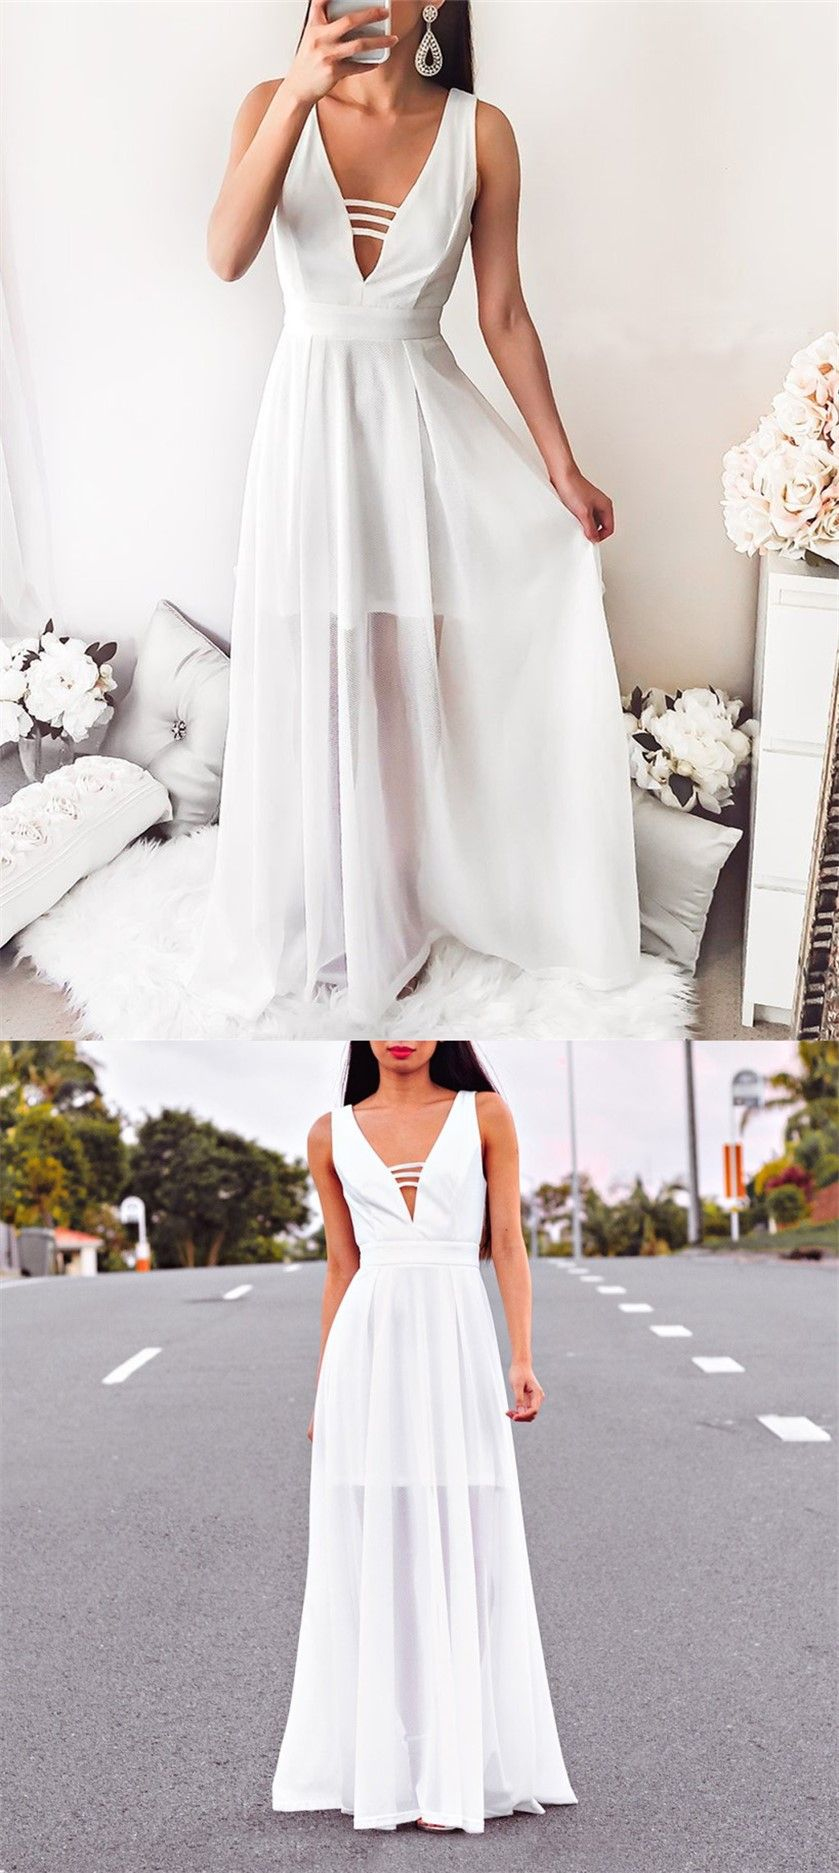 Aline deep vneck sleeveless white chiffon floor length prom dress